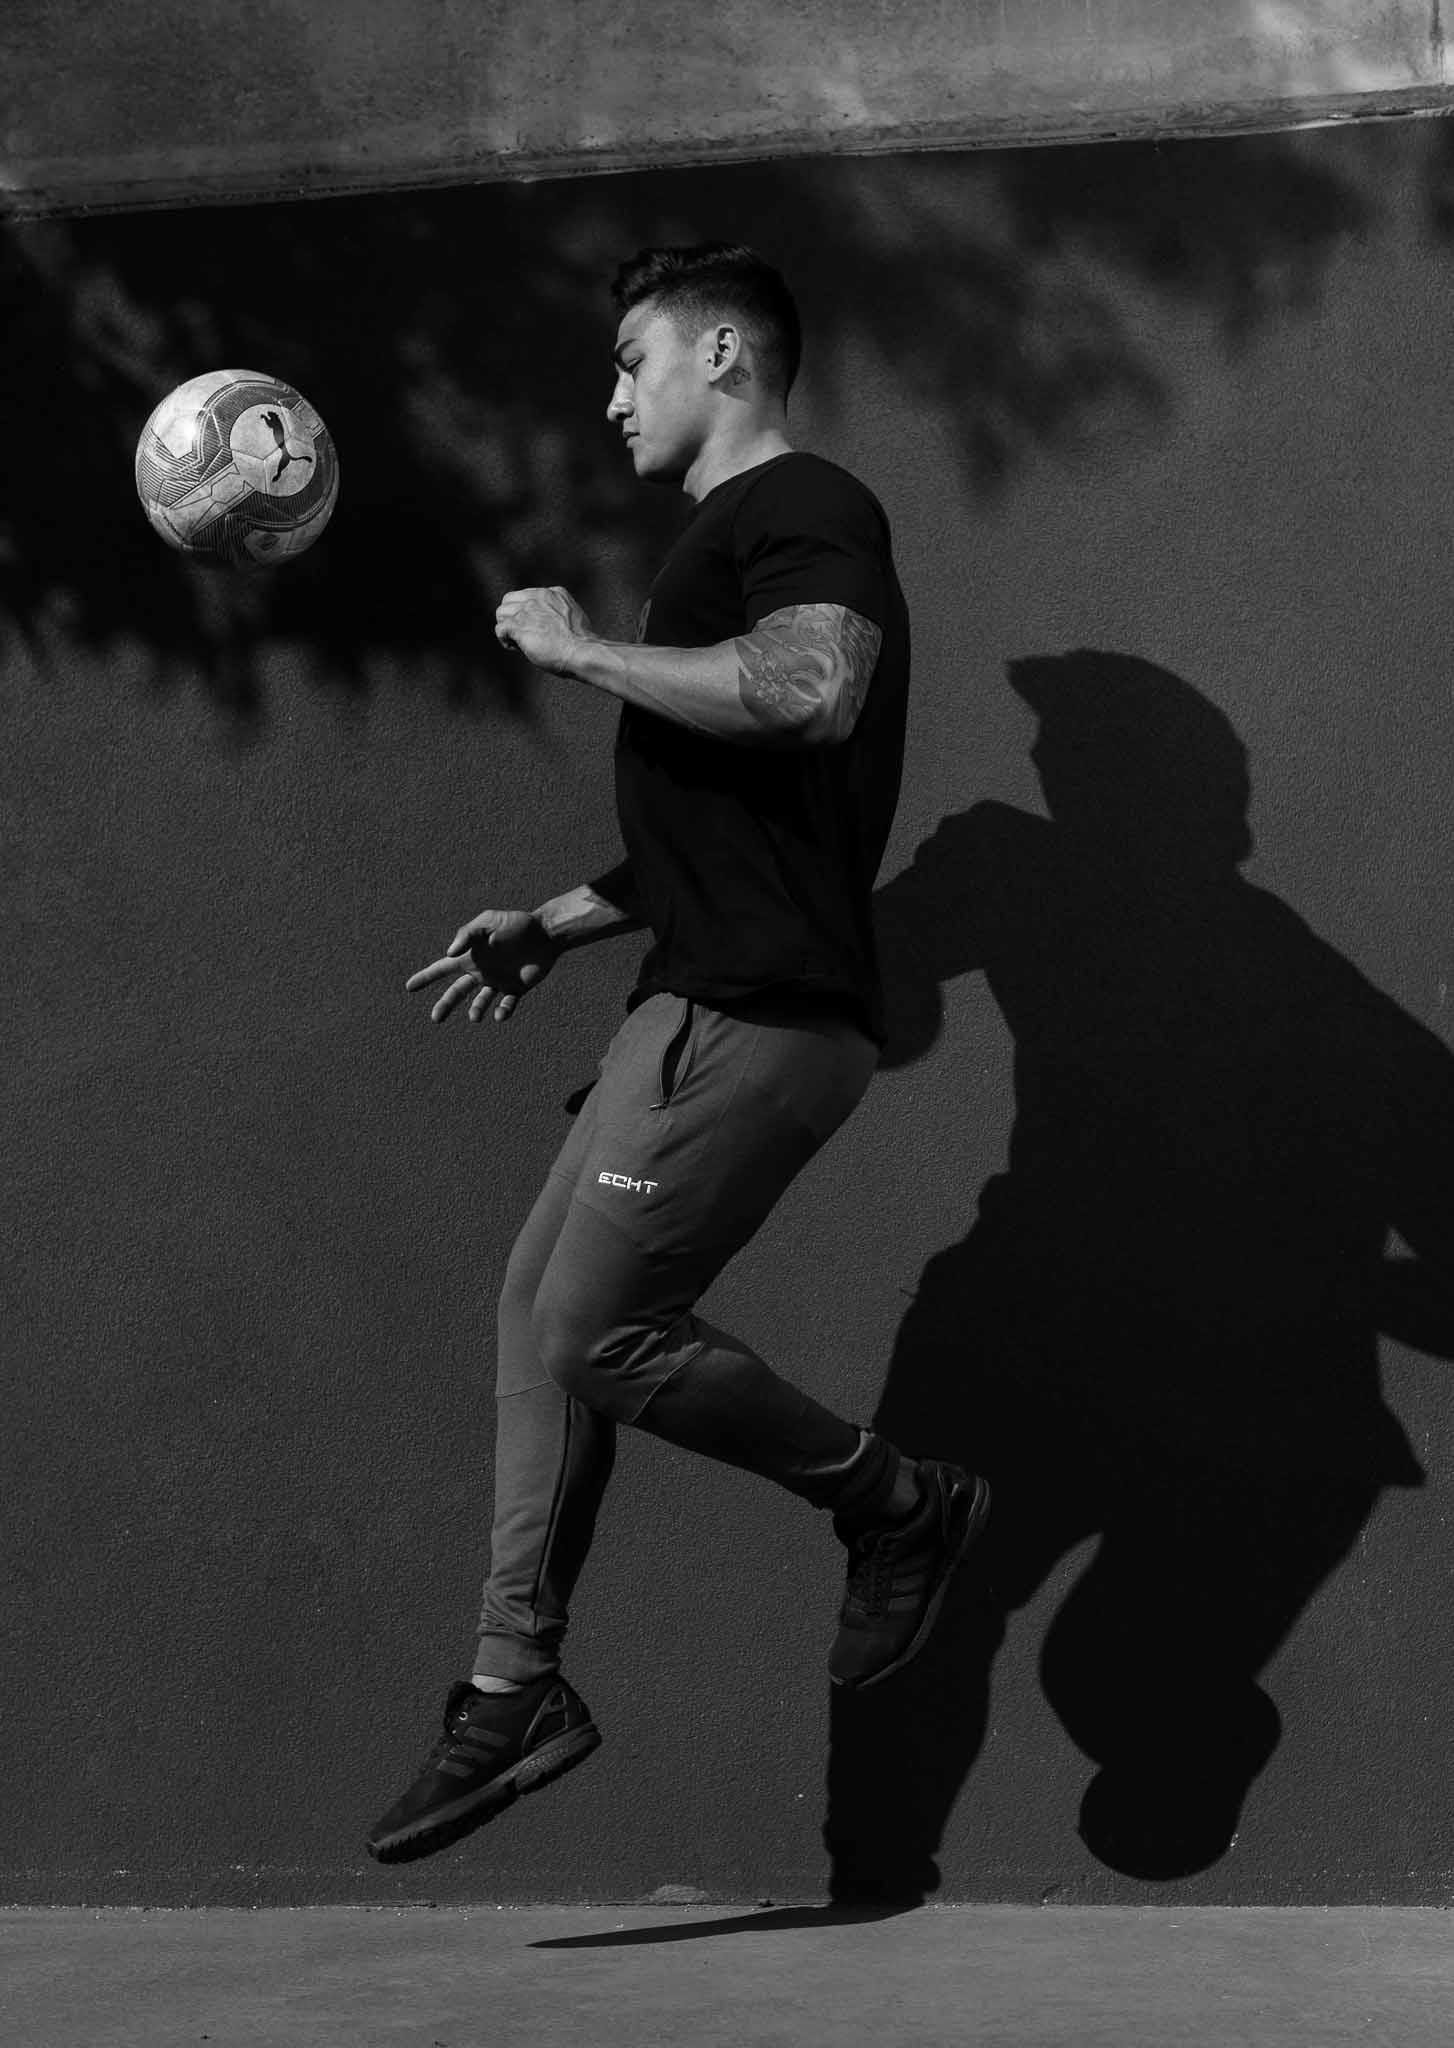 James Melbourne's Mediterranean fitness model is playing soccer skills